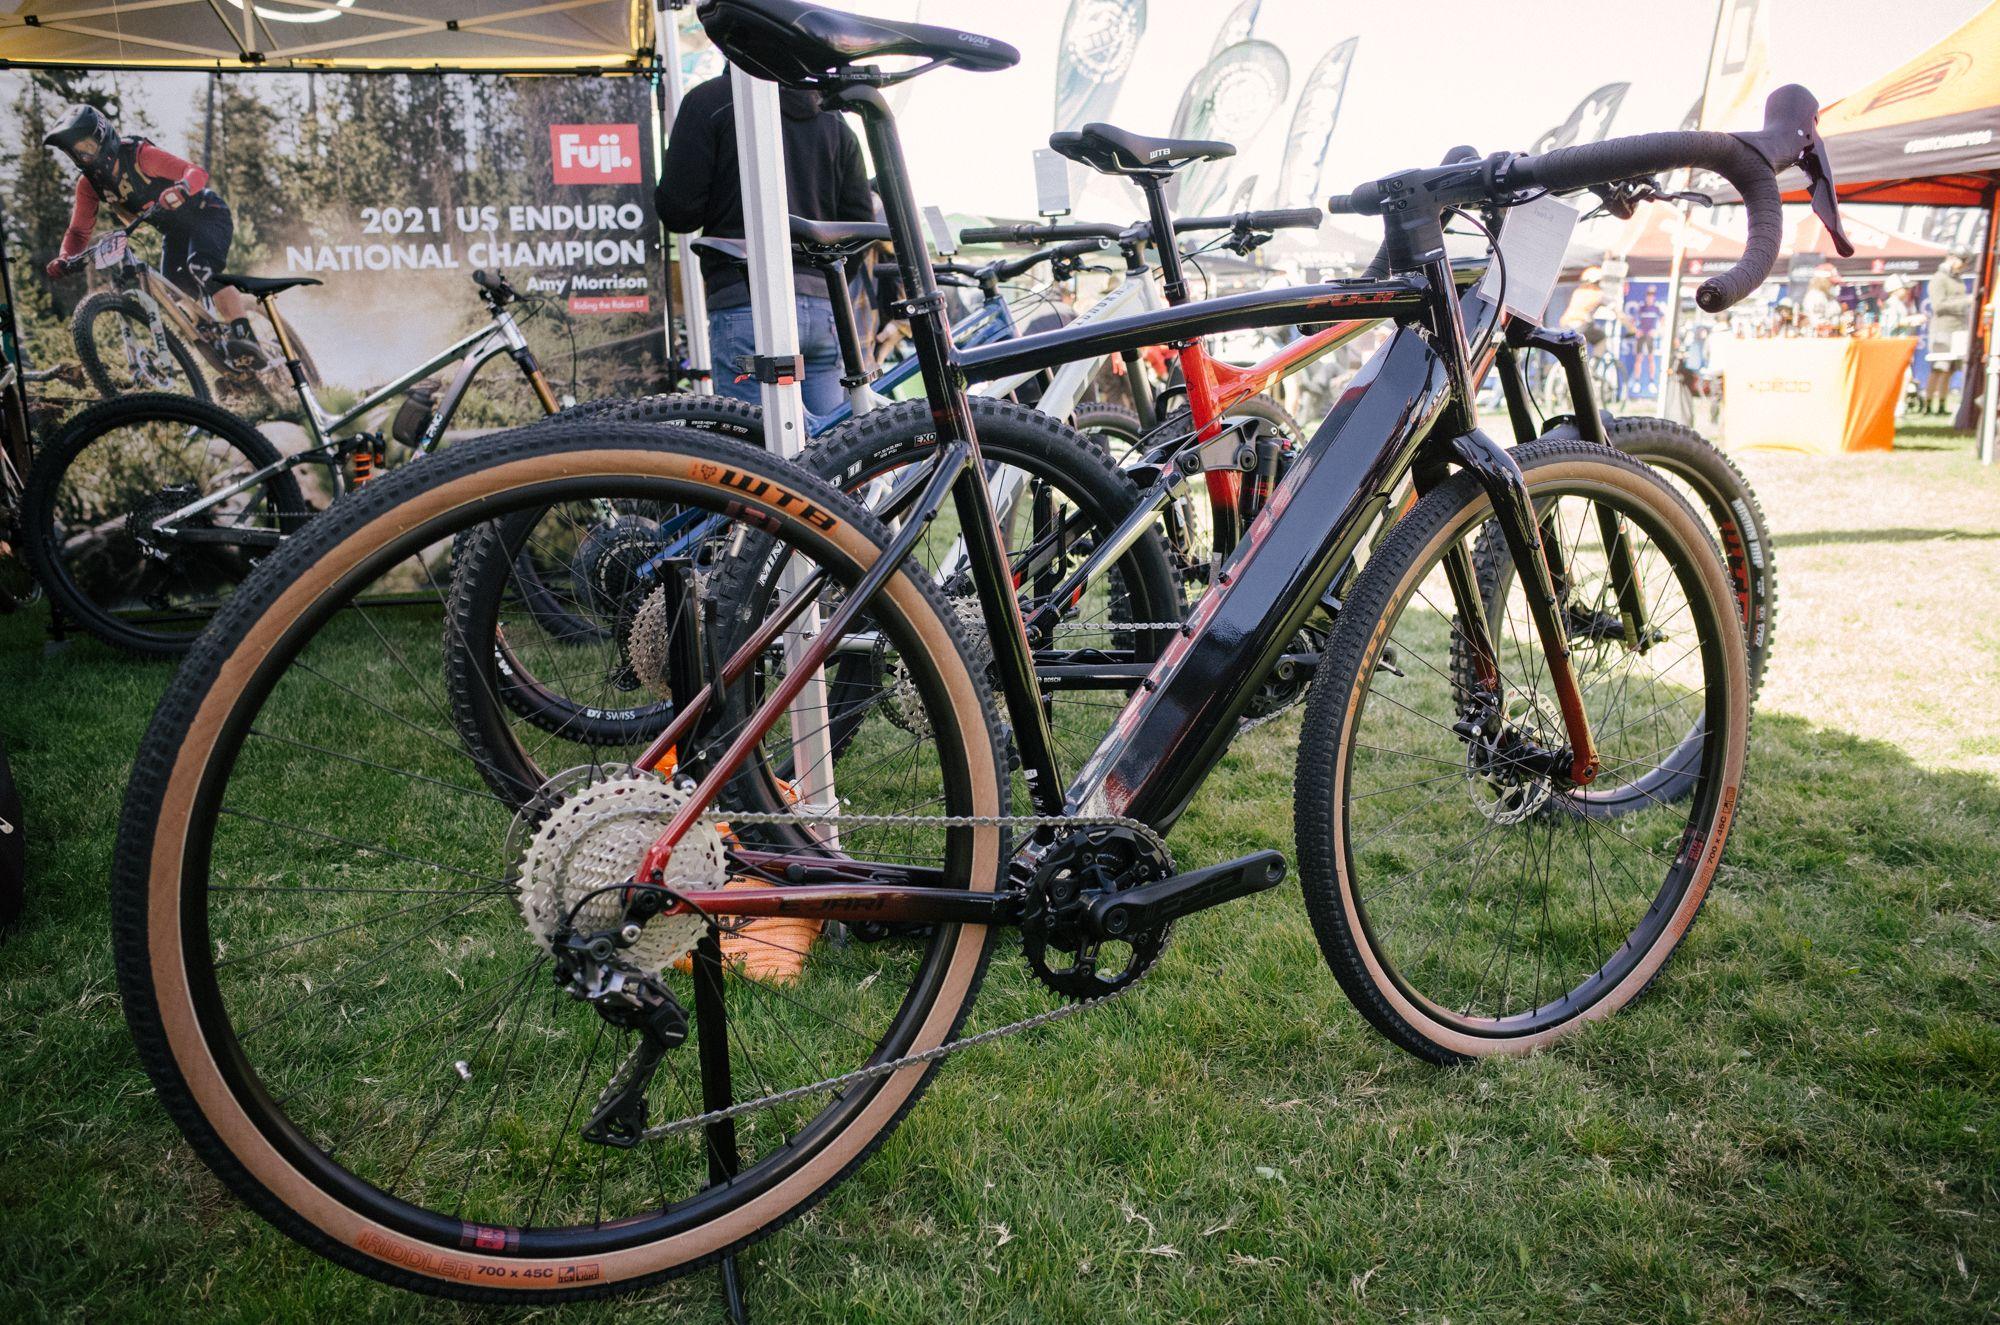 Trends collide! Fuji's E-Jari brings together gravel and e-bikes.